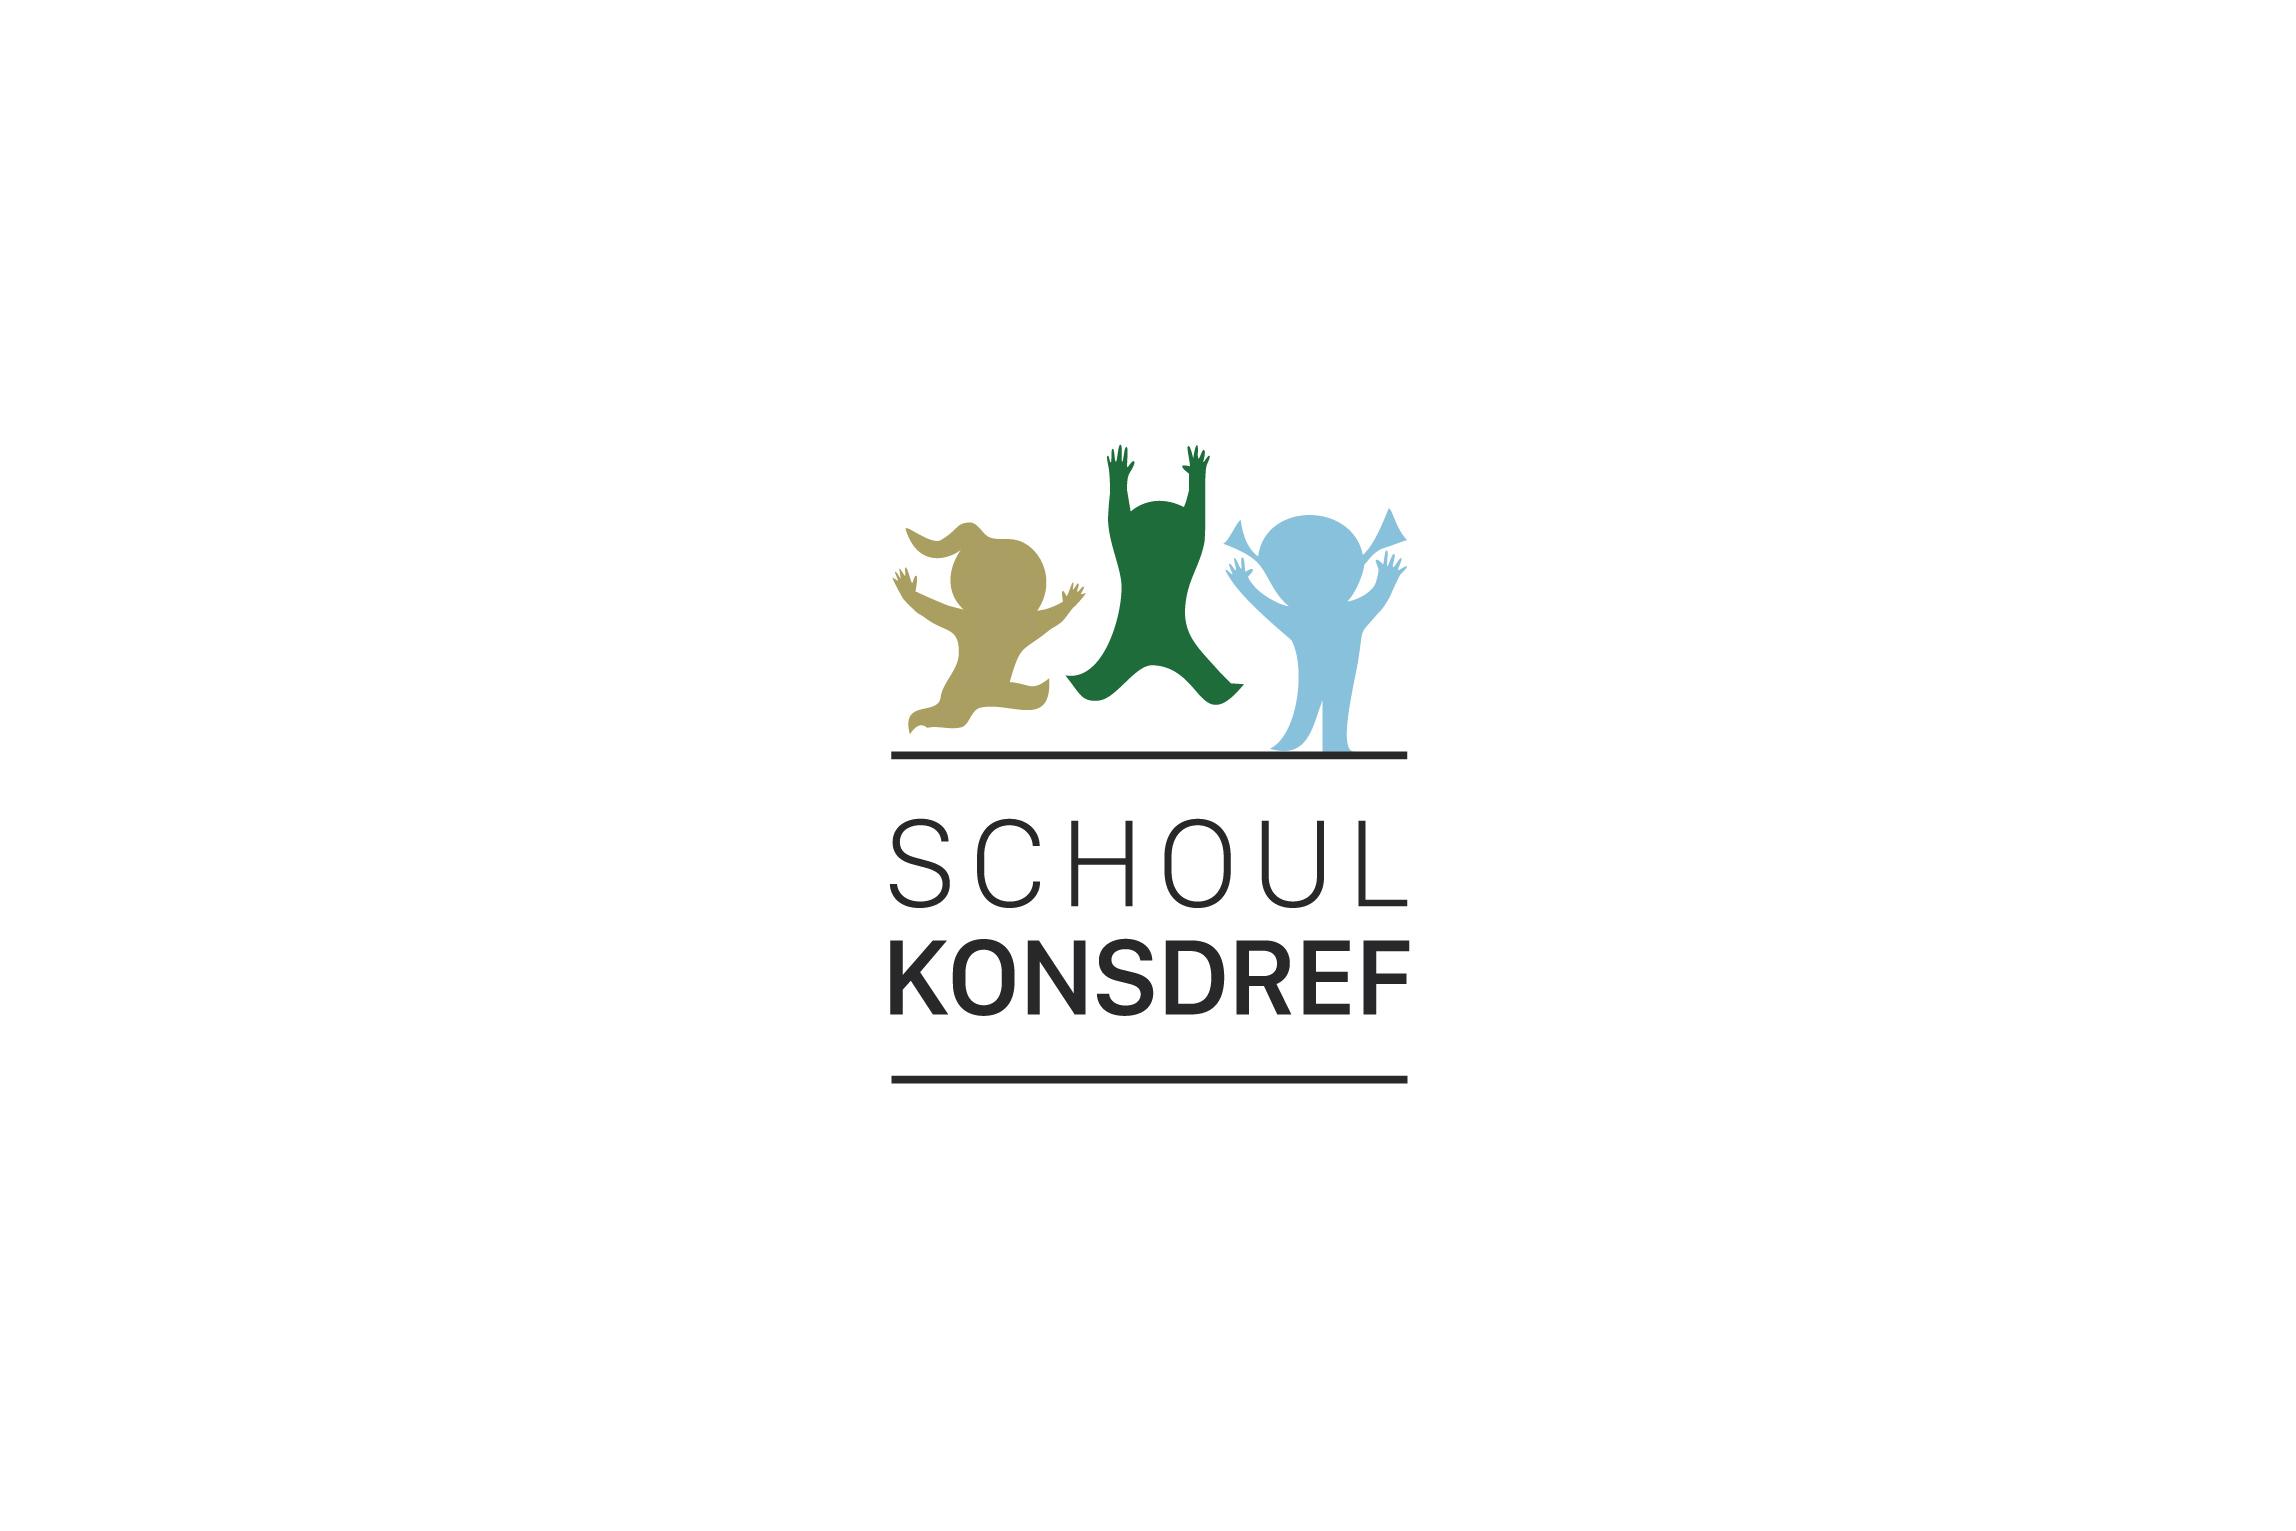 REPERES_Commune de Consdorf_logo_couleur